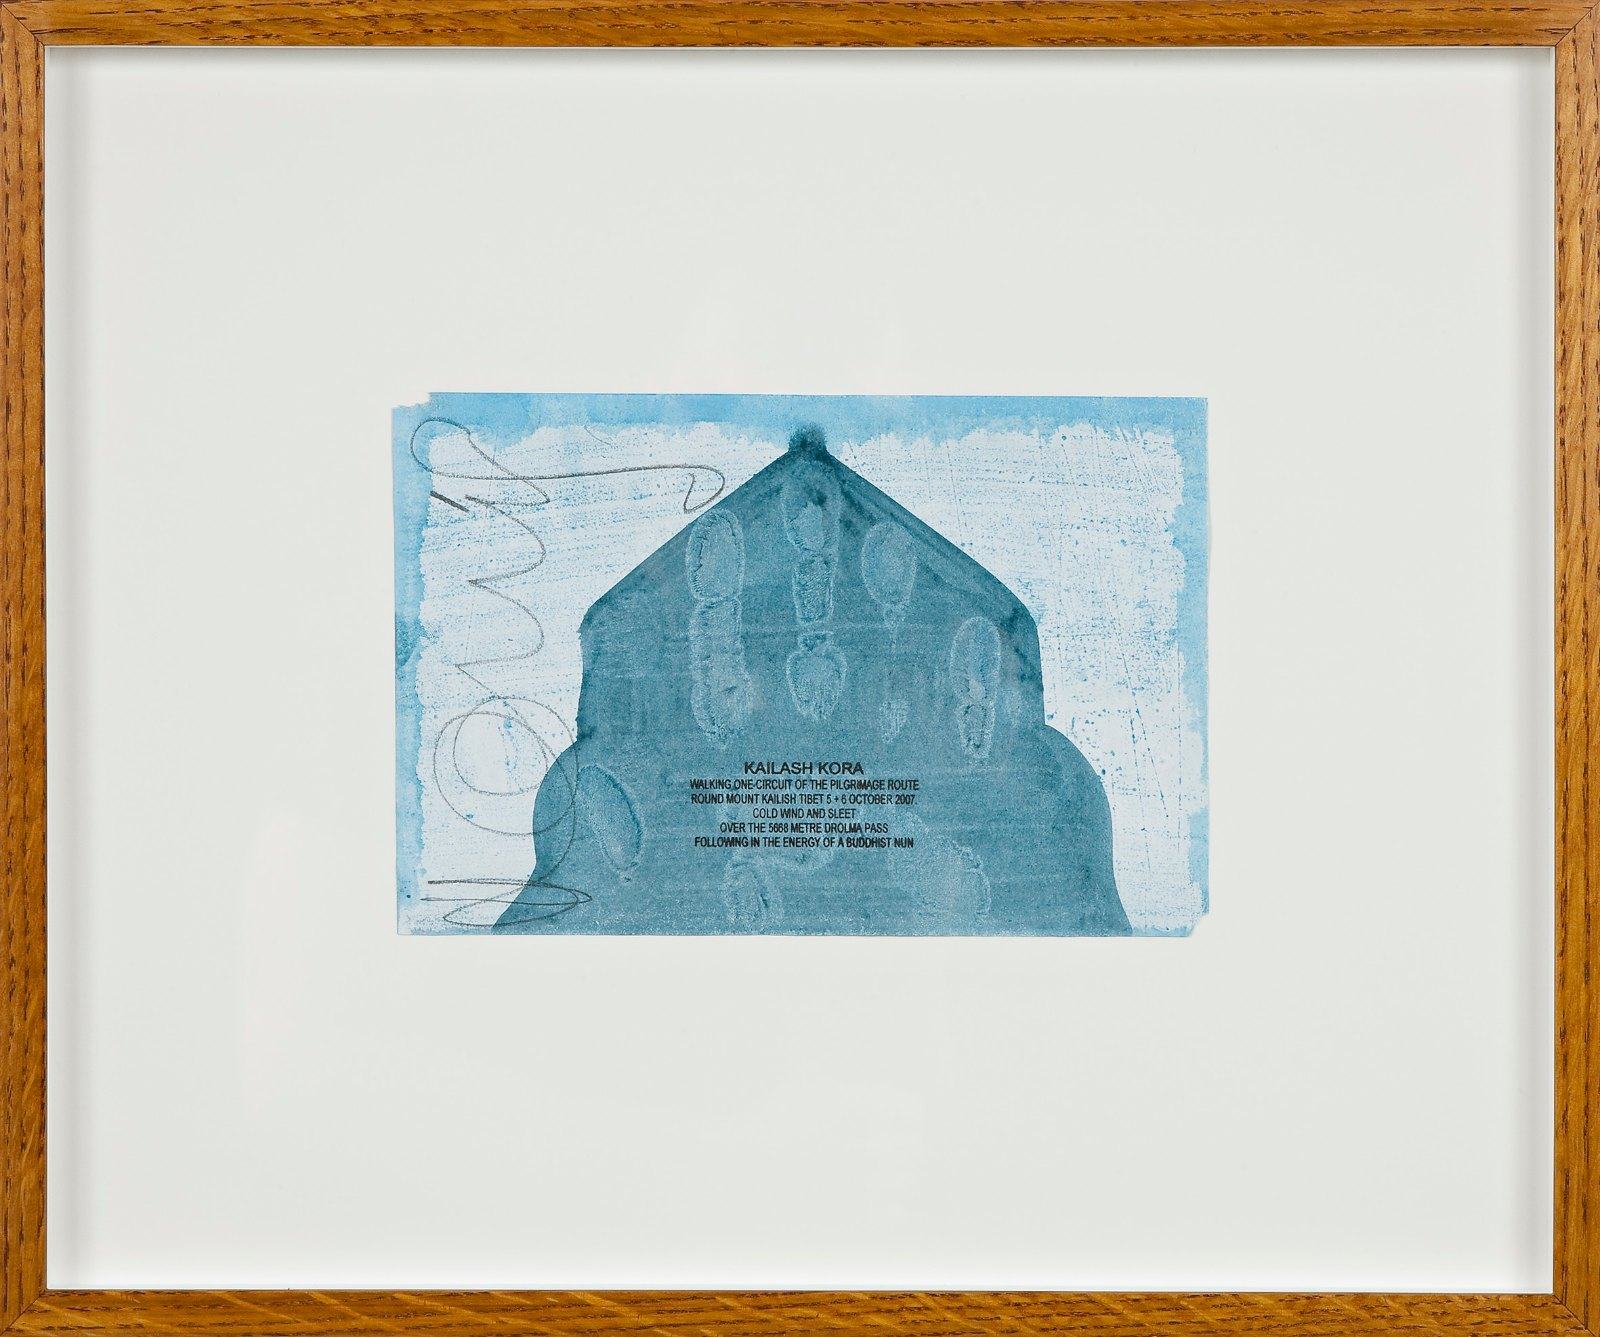 Kailash Kora, 2007, ink walk text on acrylic in artist frame, 14.5 x 22 cm